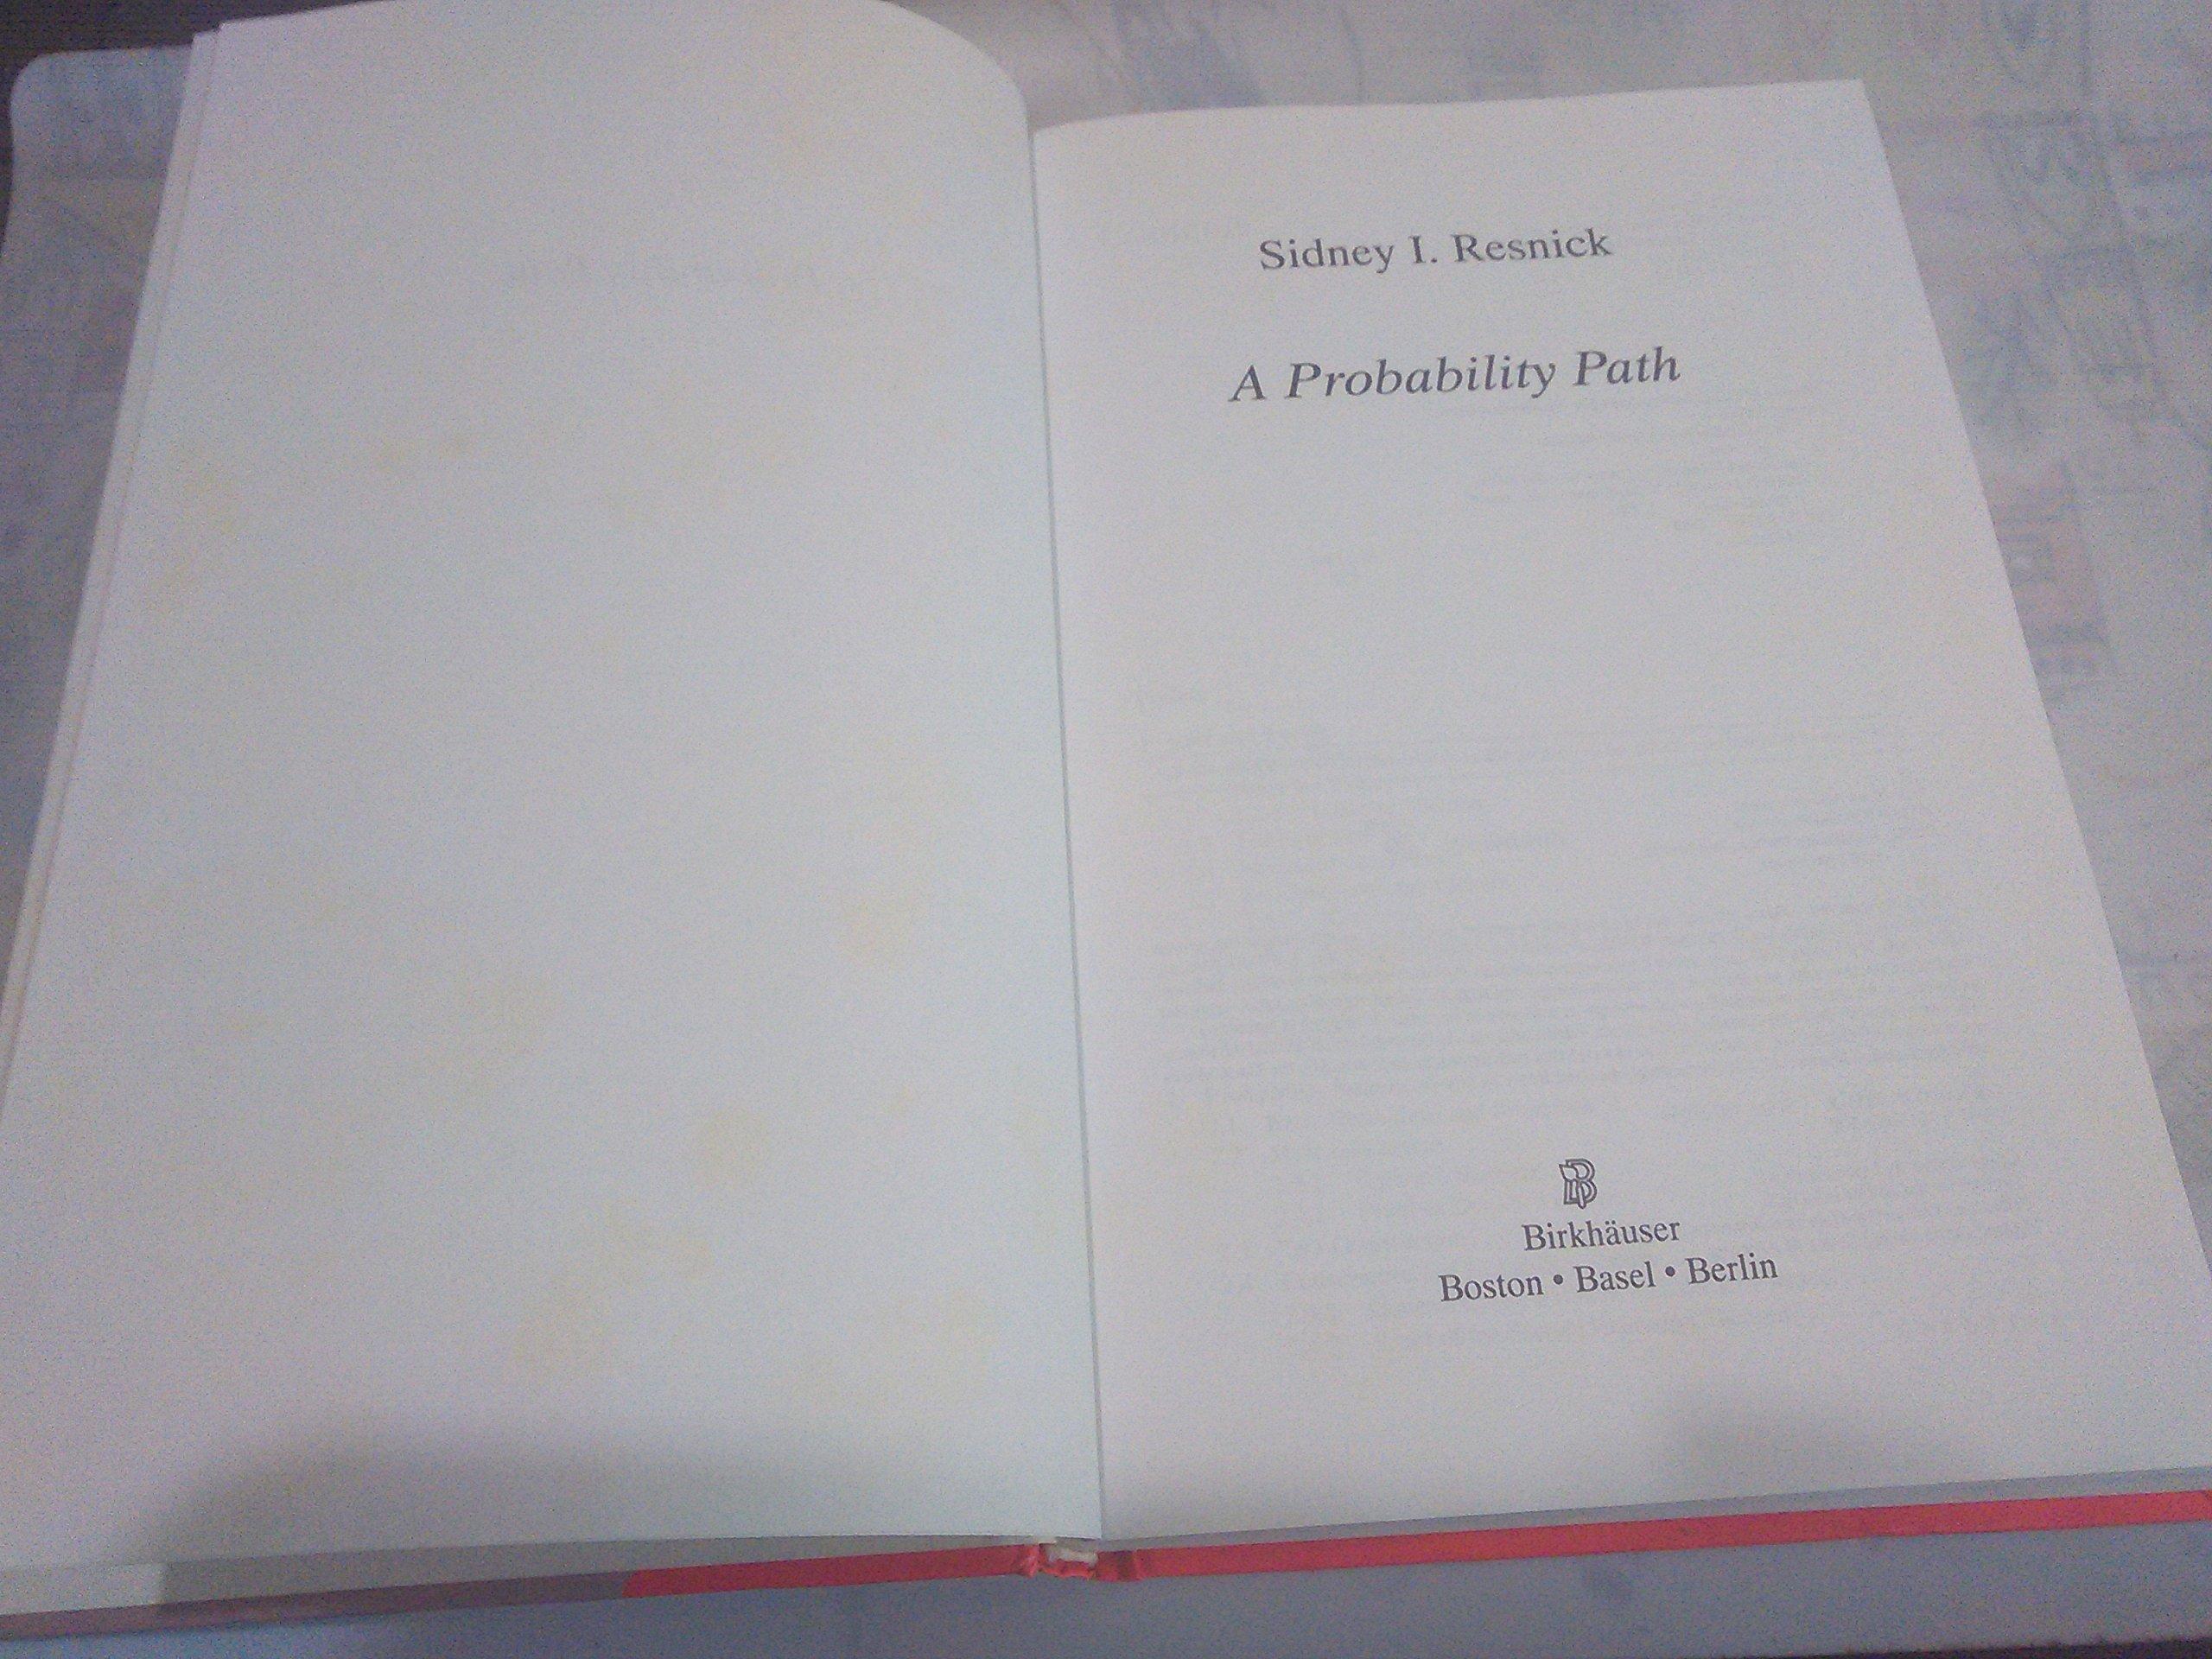 A probability path sidney i resnick 9783764340551 amazon a probability path sidney i resnick 9783764340551 amazon books fandeluxe Choice Image